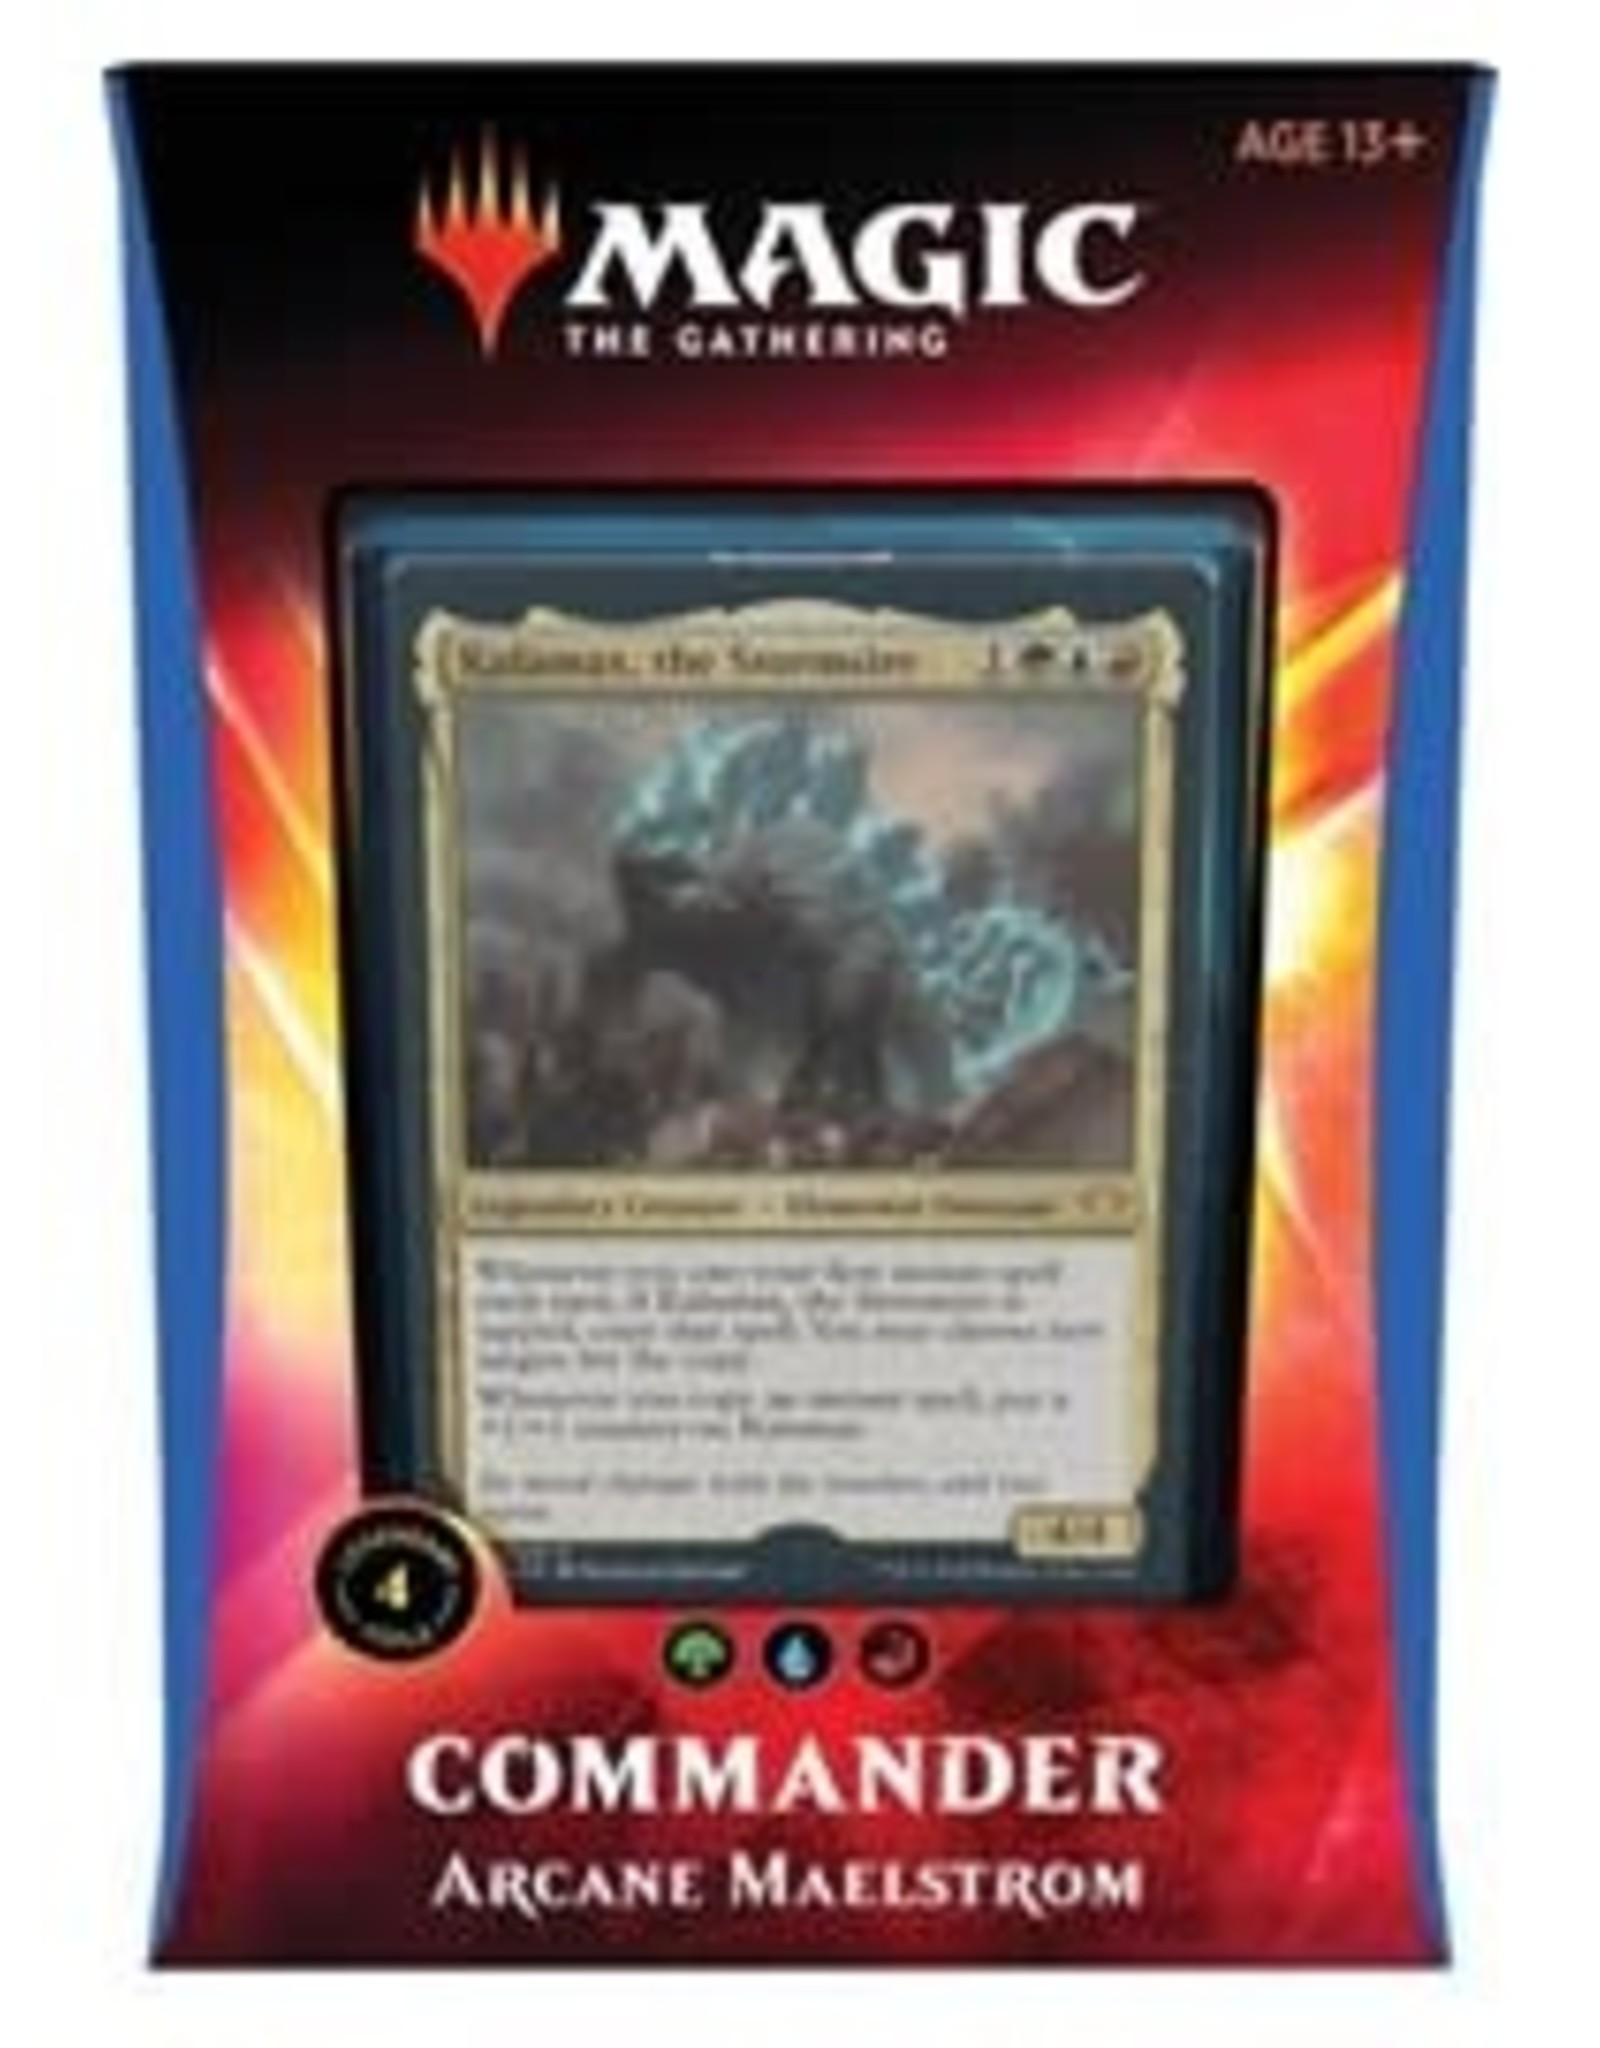 Magic: The Gathering Commander 2020 Deck - Arcane Maelstrom